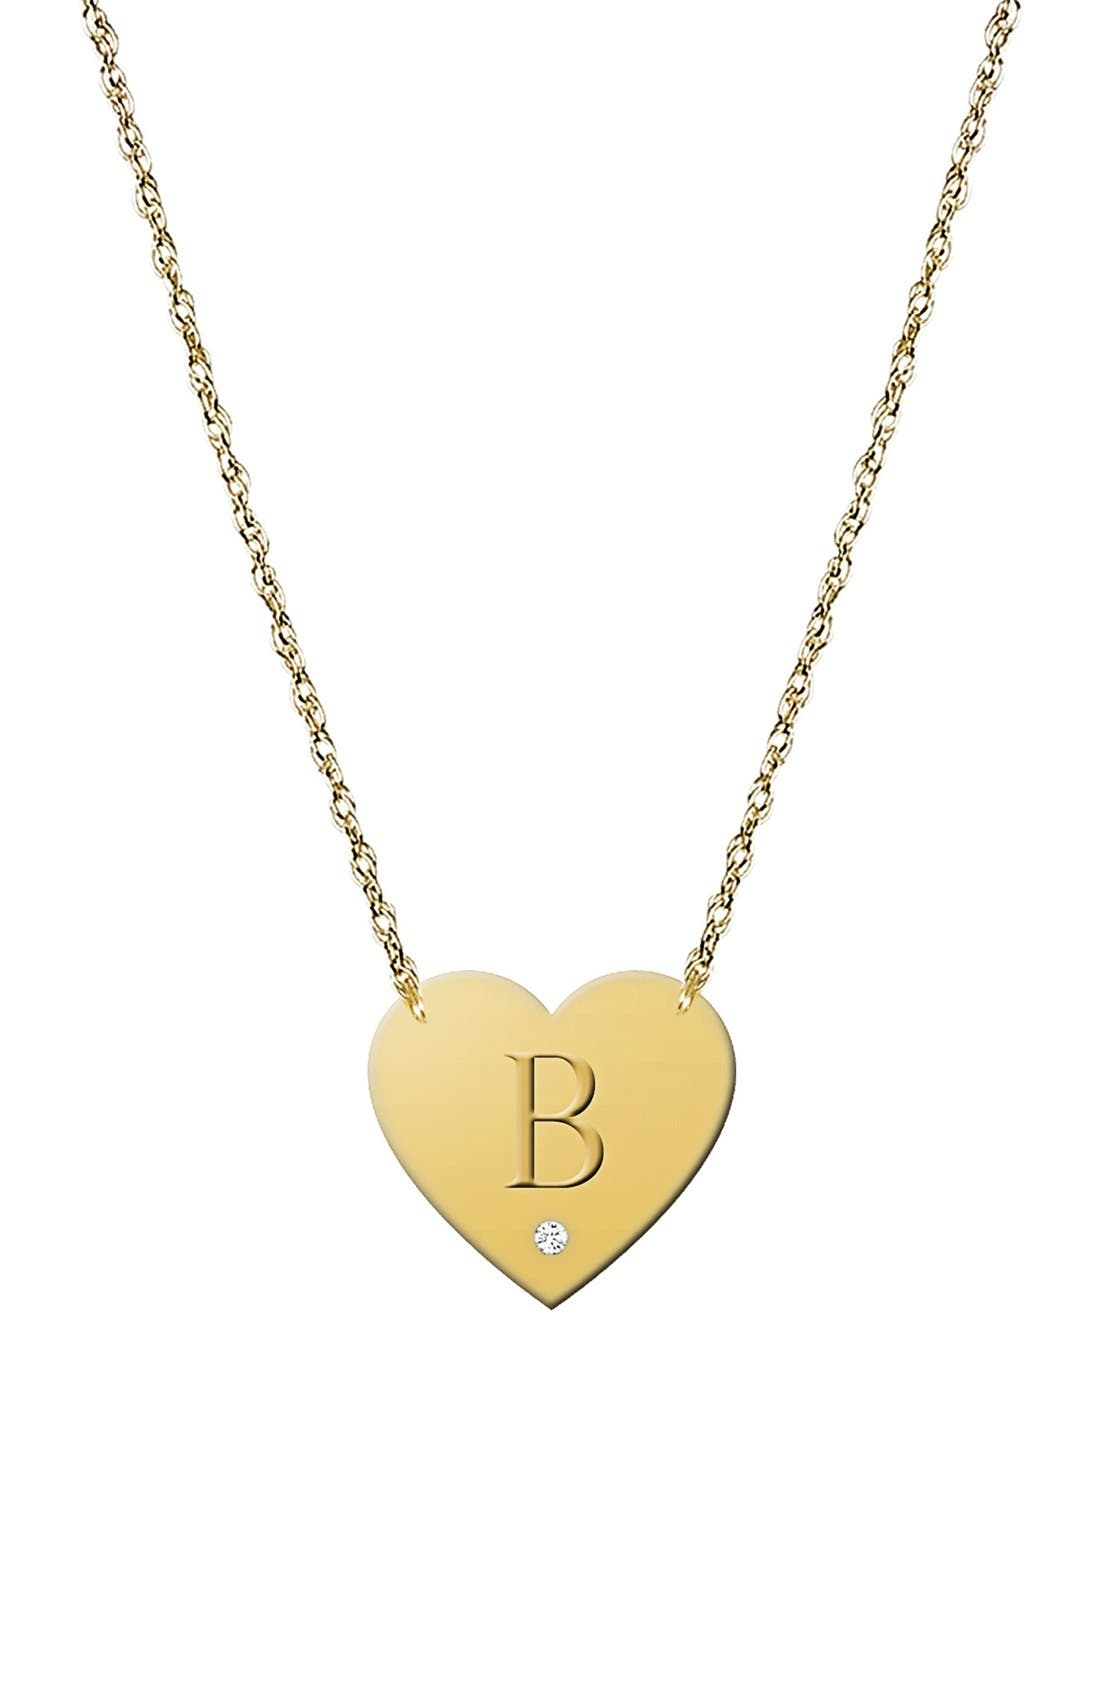 JANE BASCH DESIGNS Diamond & Initial Pendant Necklace